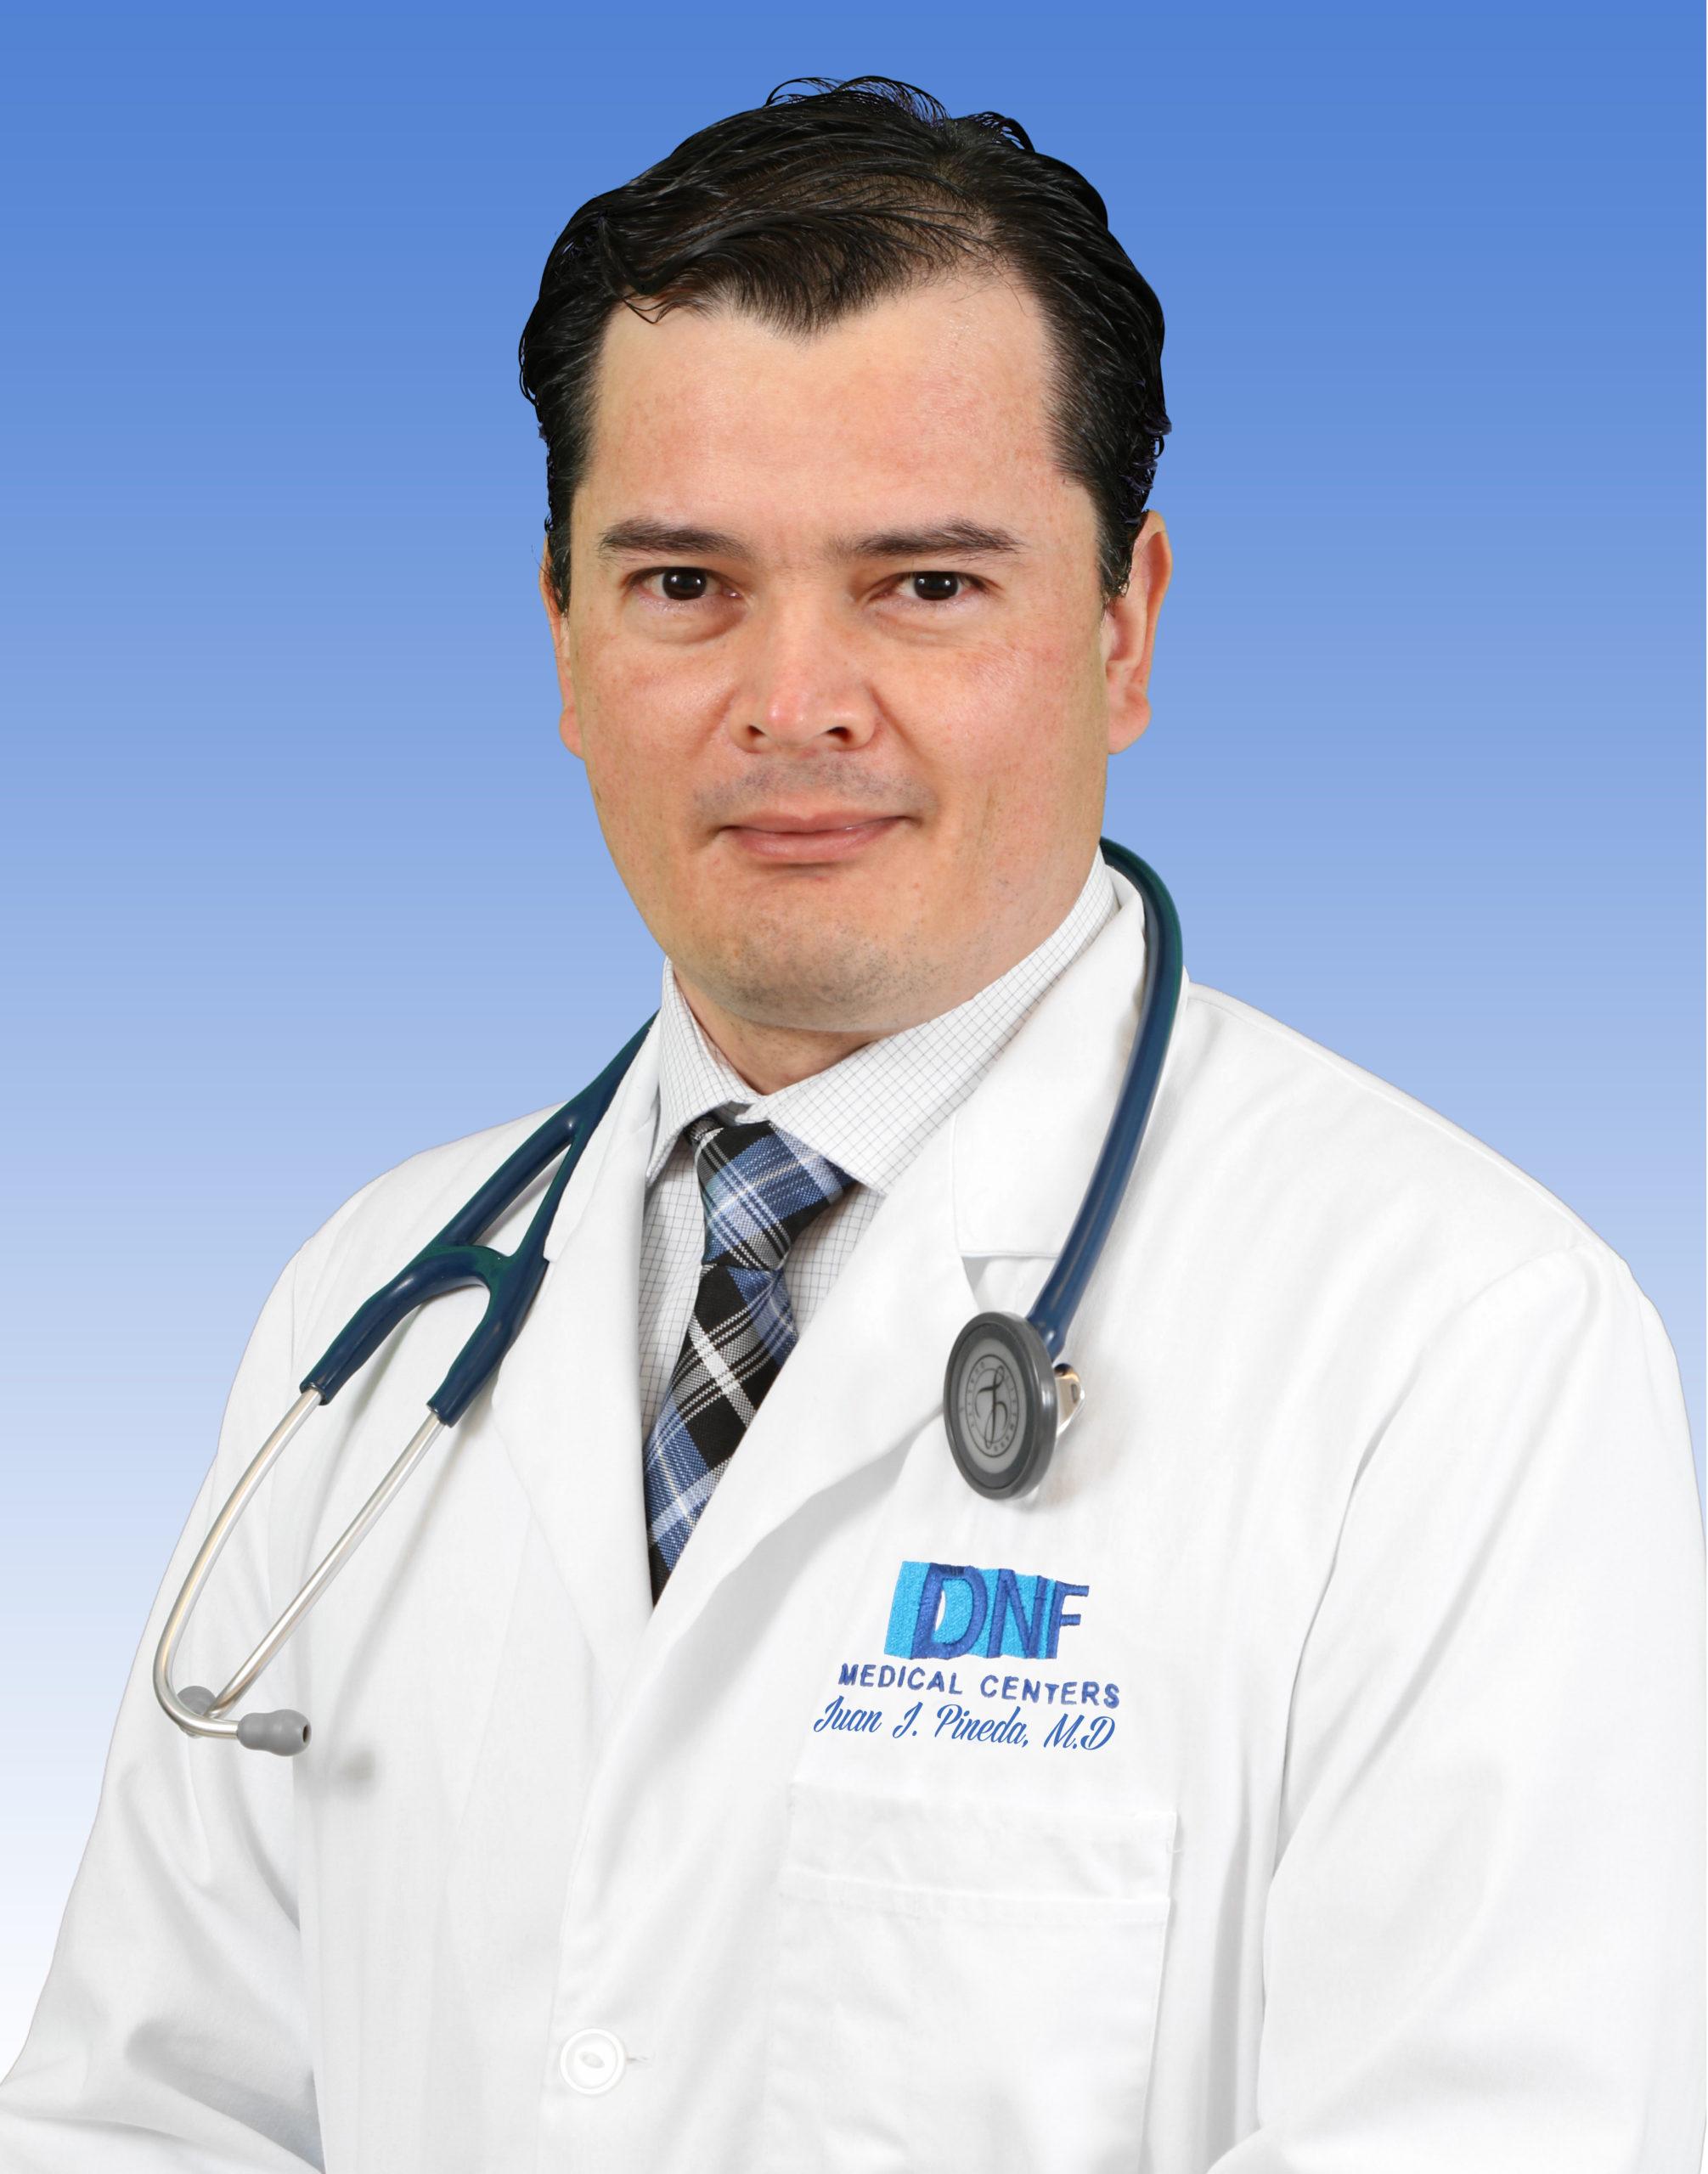 Juan J. Pineda, MD